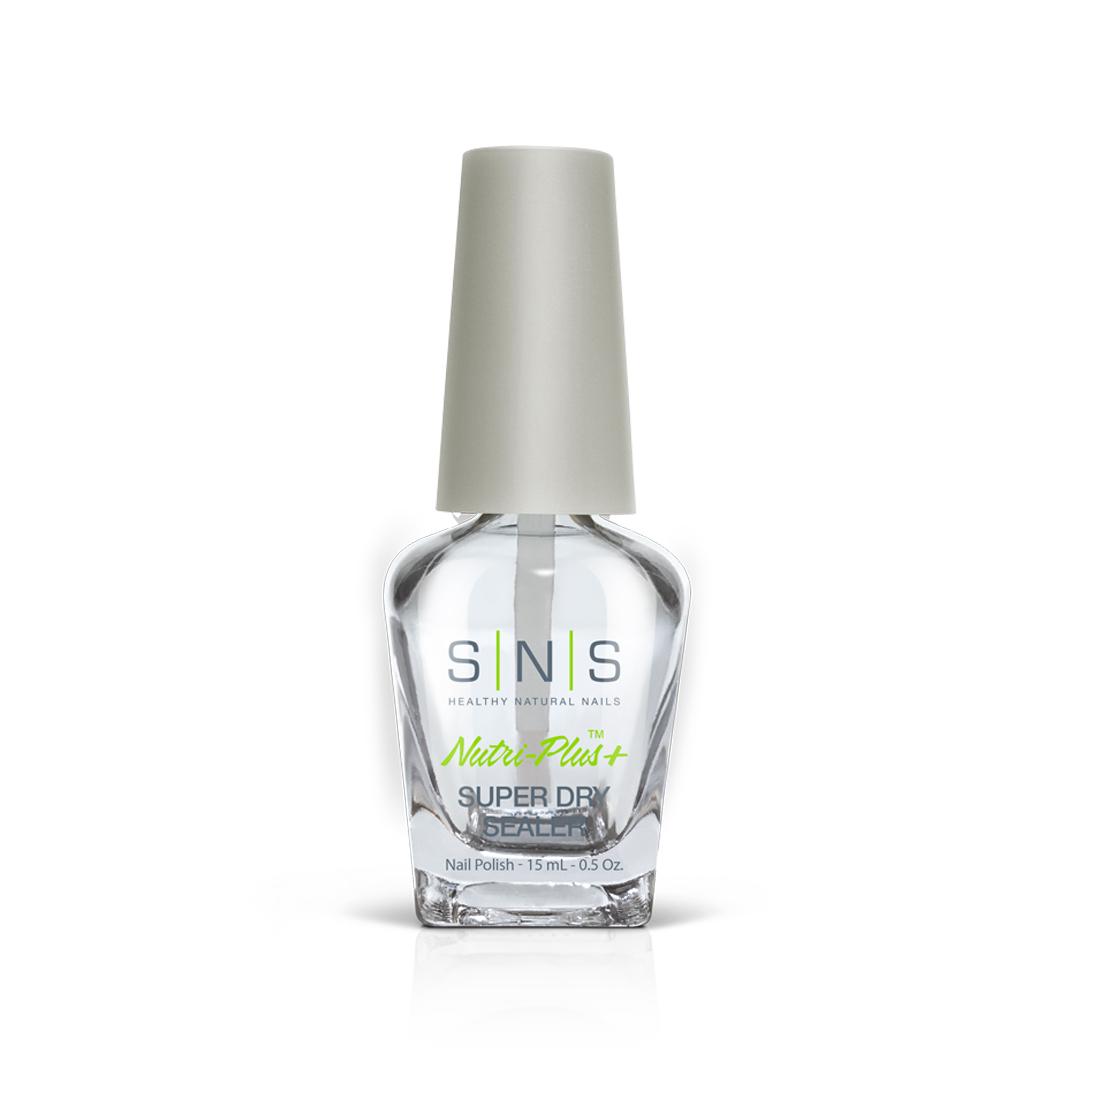 SNS Sealer Dry 0.5oz 15ml